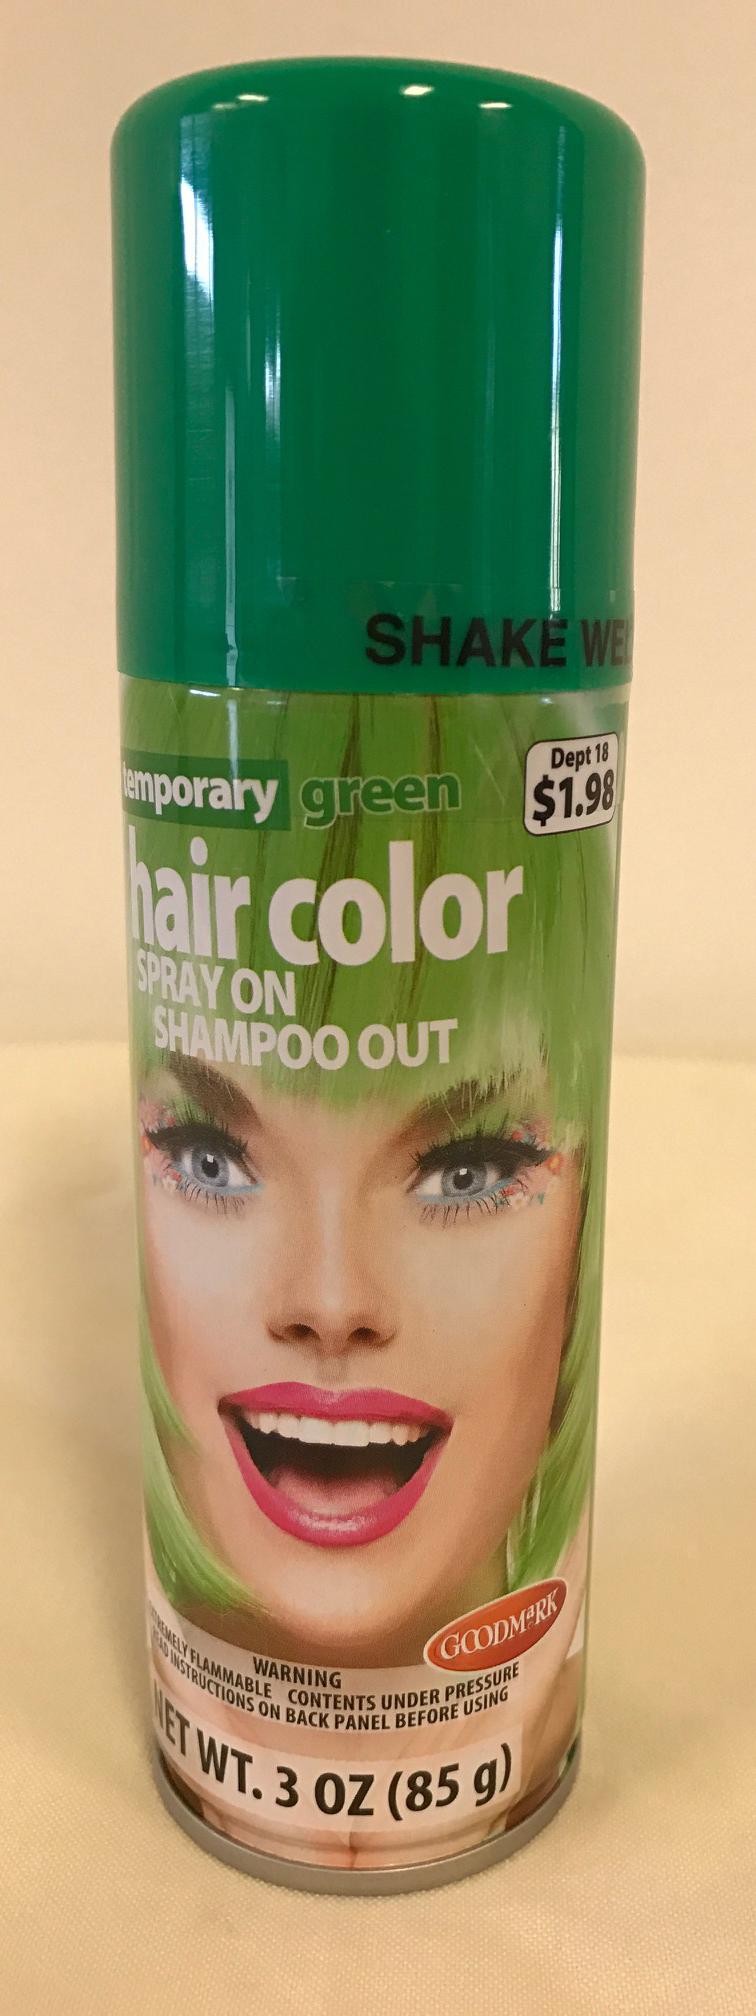 Goodmark Halloween Temporary Hair Color Spray Green Walmart